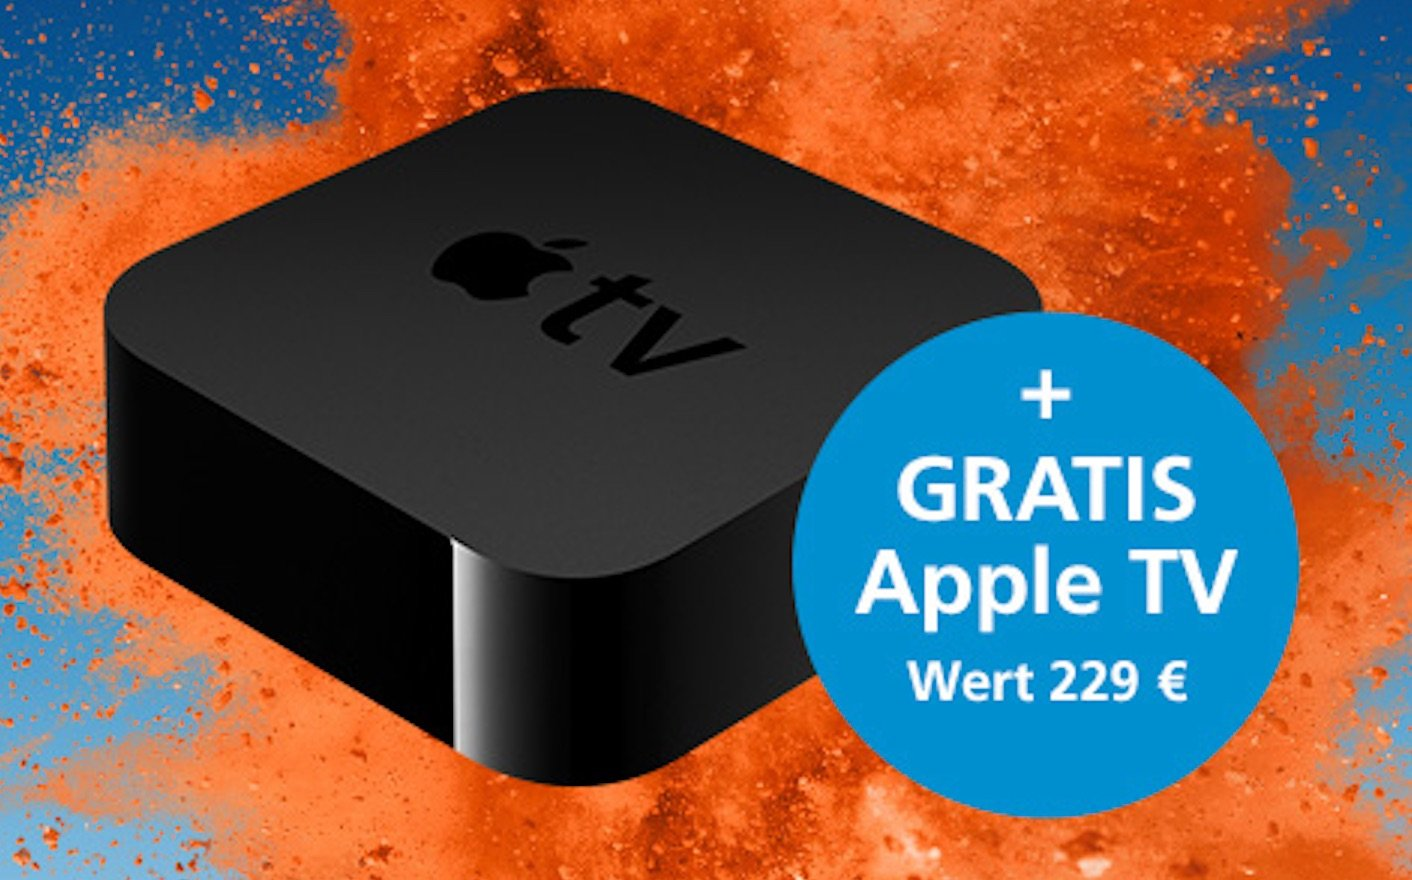 O2 Super-Bundle: O2 Free Tarife mit kostenlosem Apple TV 4 1